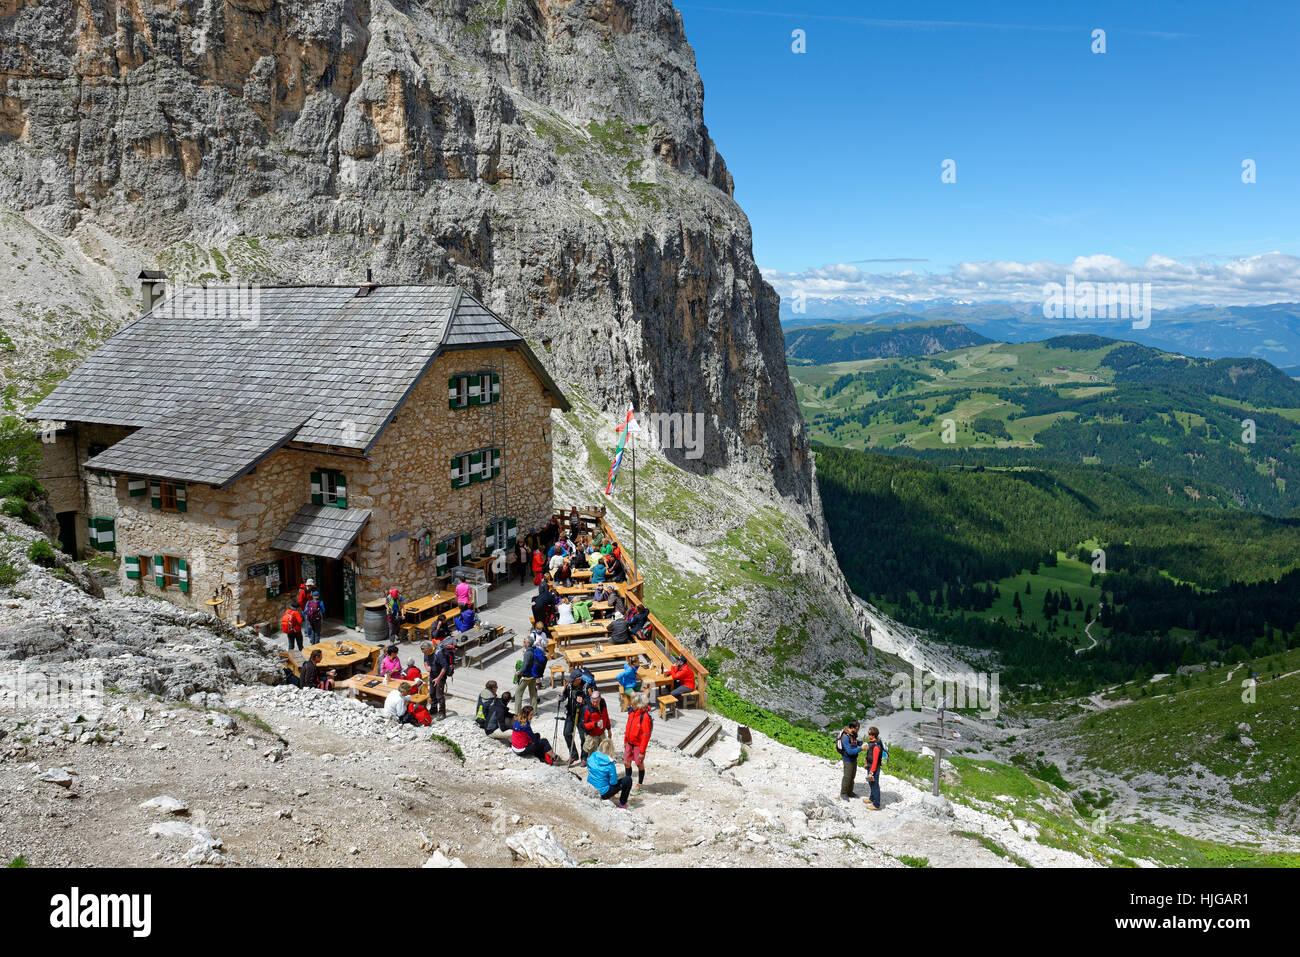 Rifugio Vicenza, Rifugio Vincenza al Sasso Lungo, Dolomites, Province of South Tyrol, Italy - Stock Image